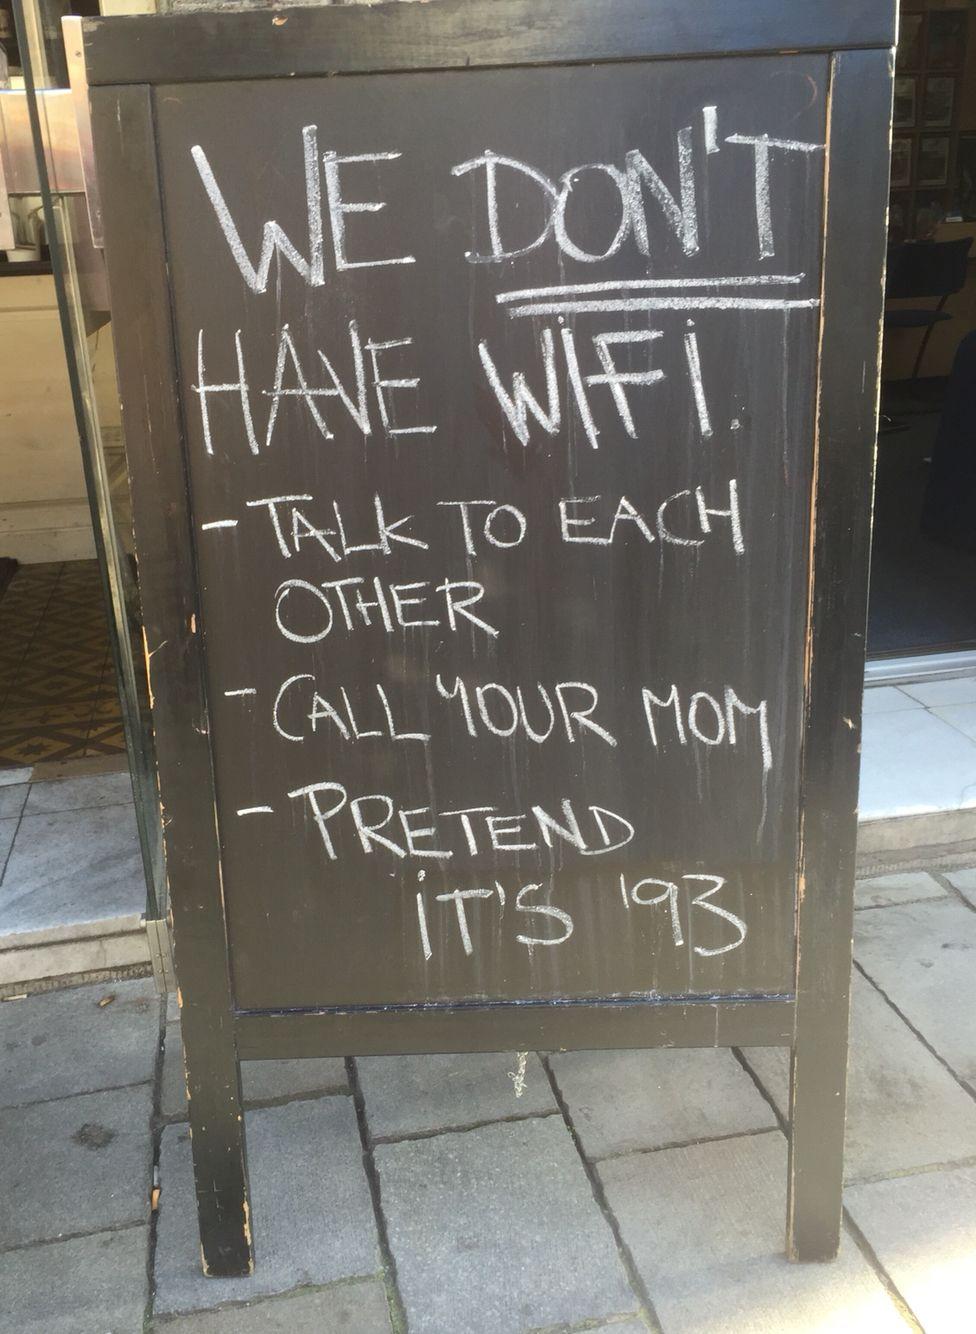 Sign outside cafe in Bratislava...made me smile.